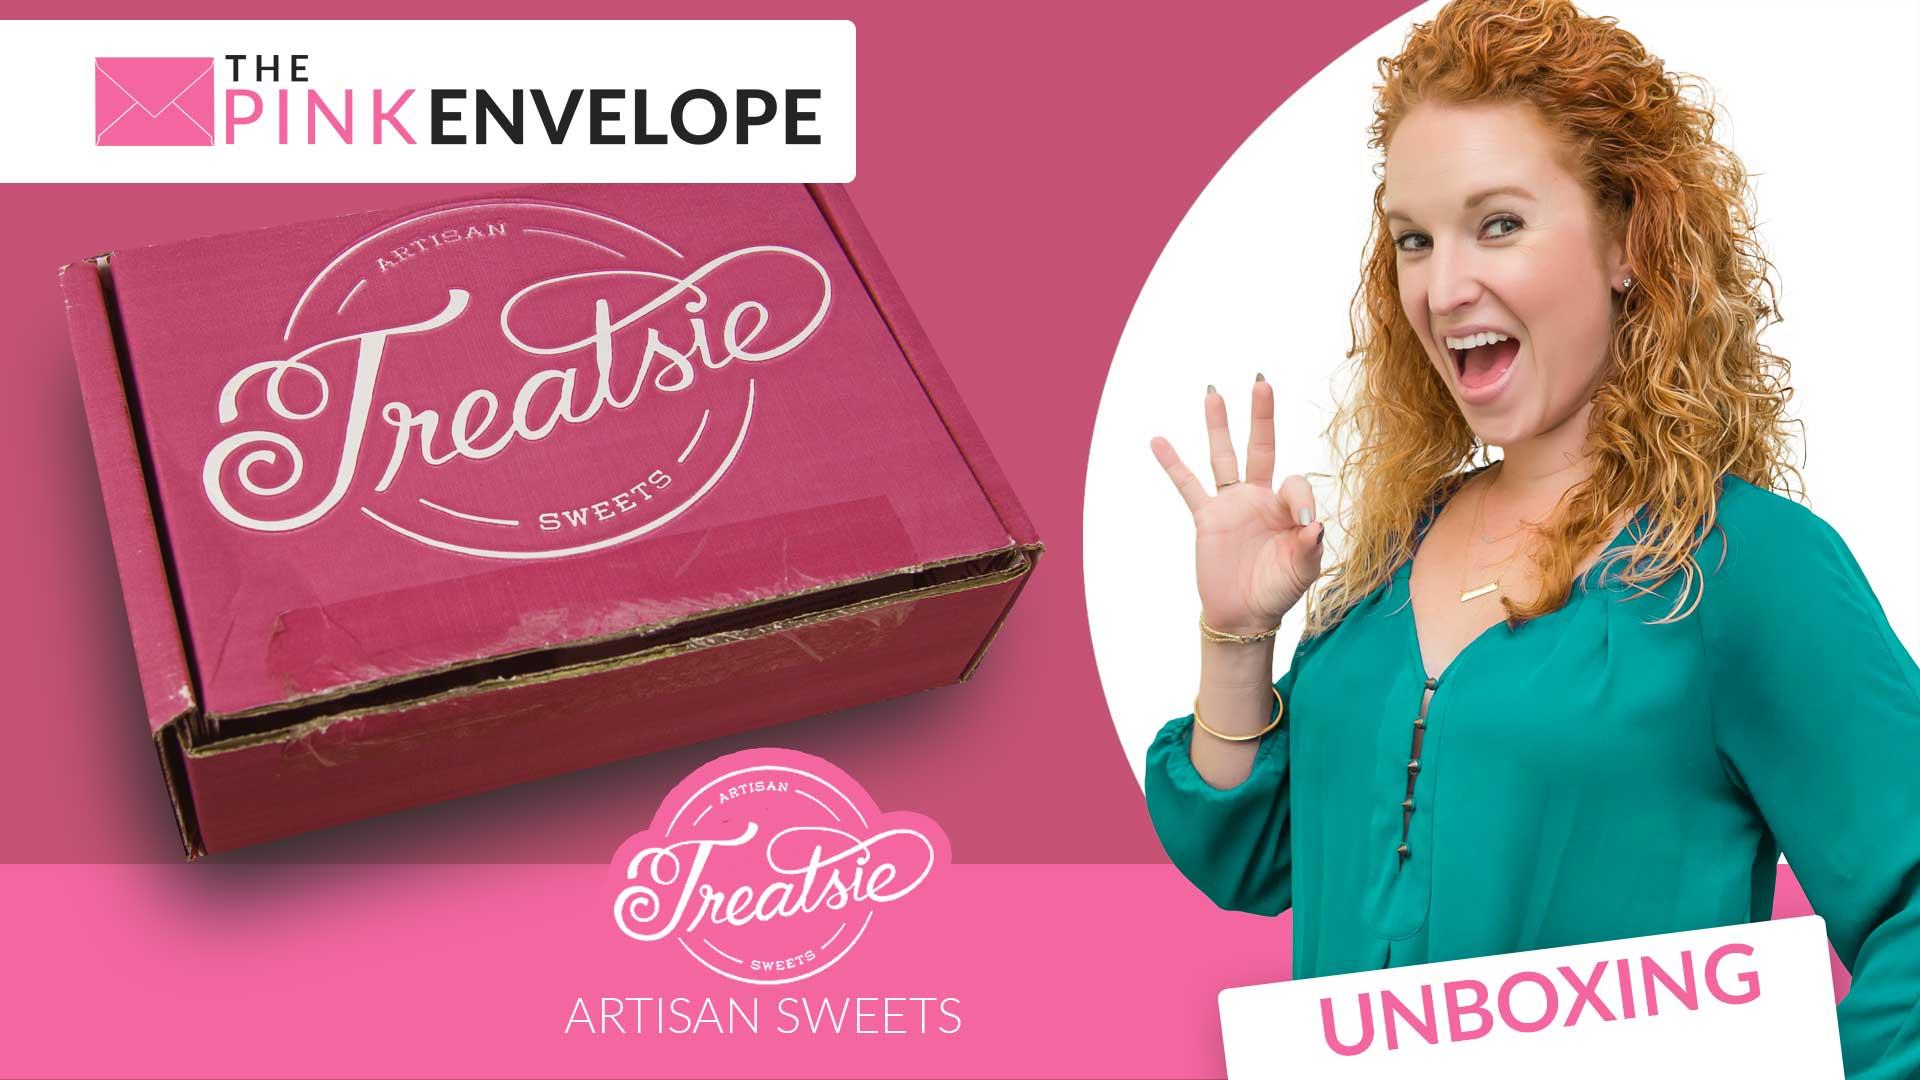 Treatsie Artisan Sweets Subscription Box *Updated w/ Important Feedback*